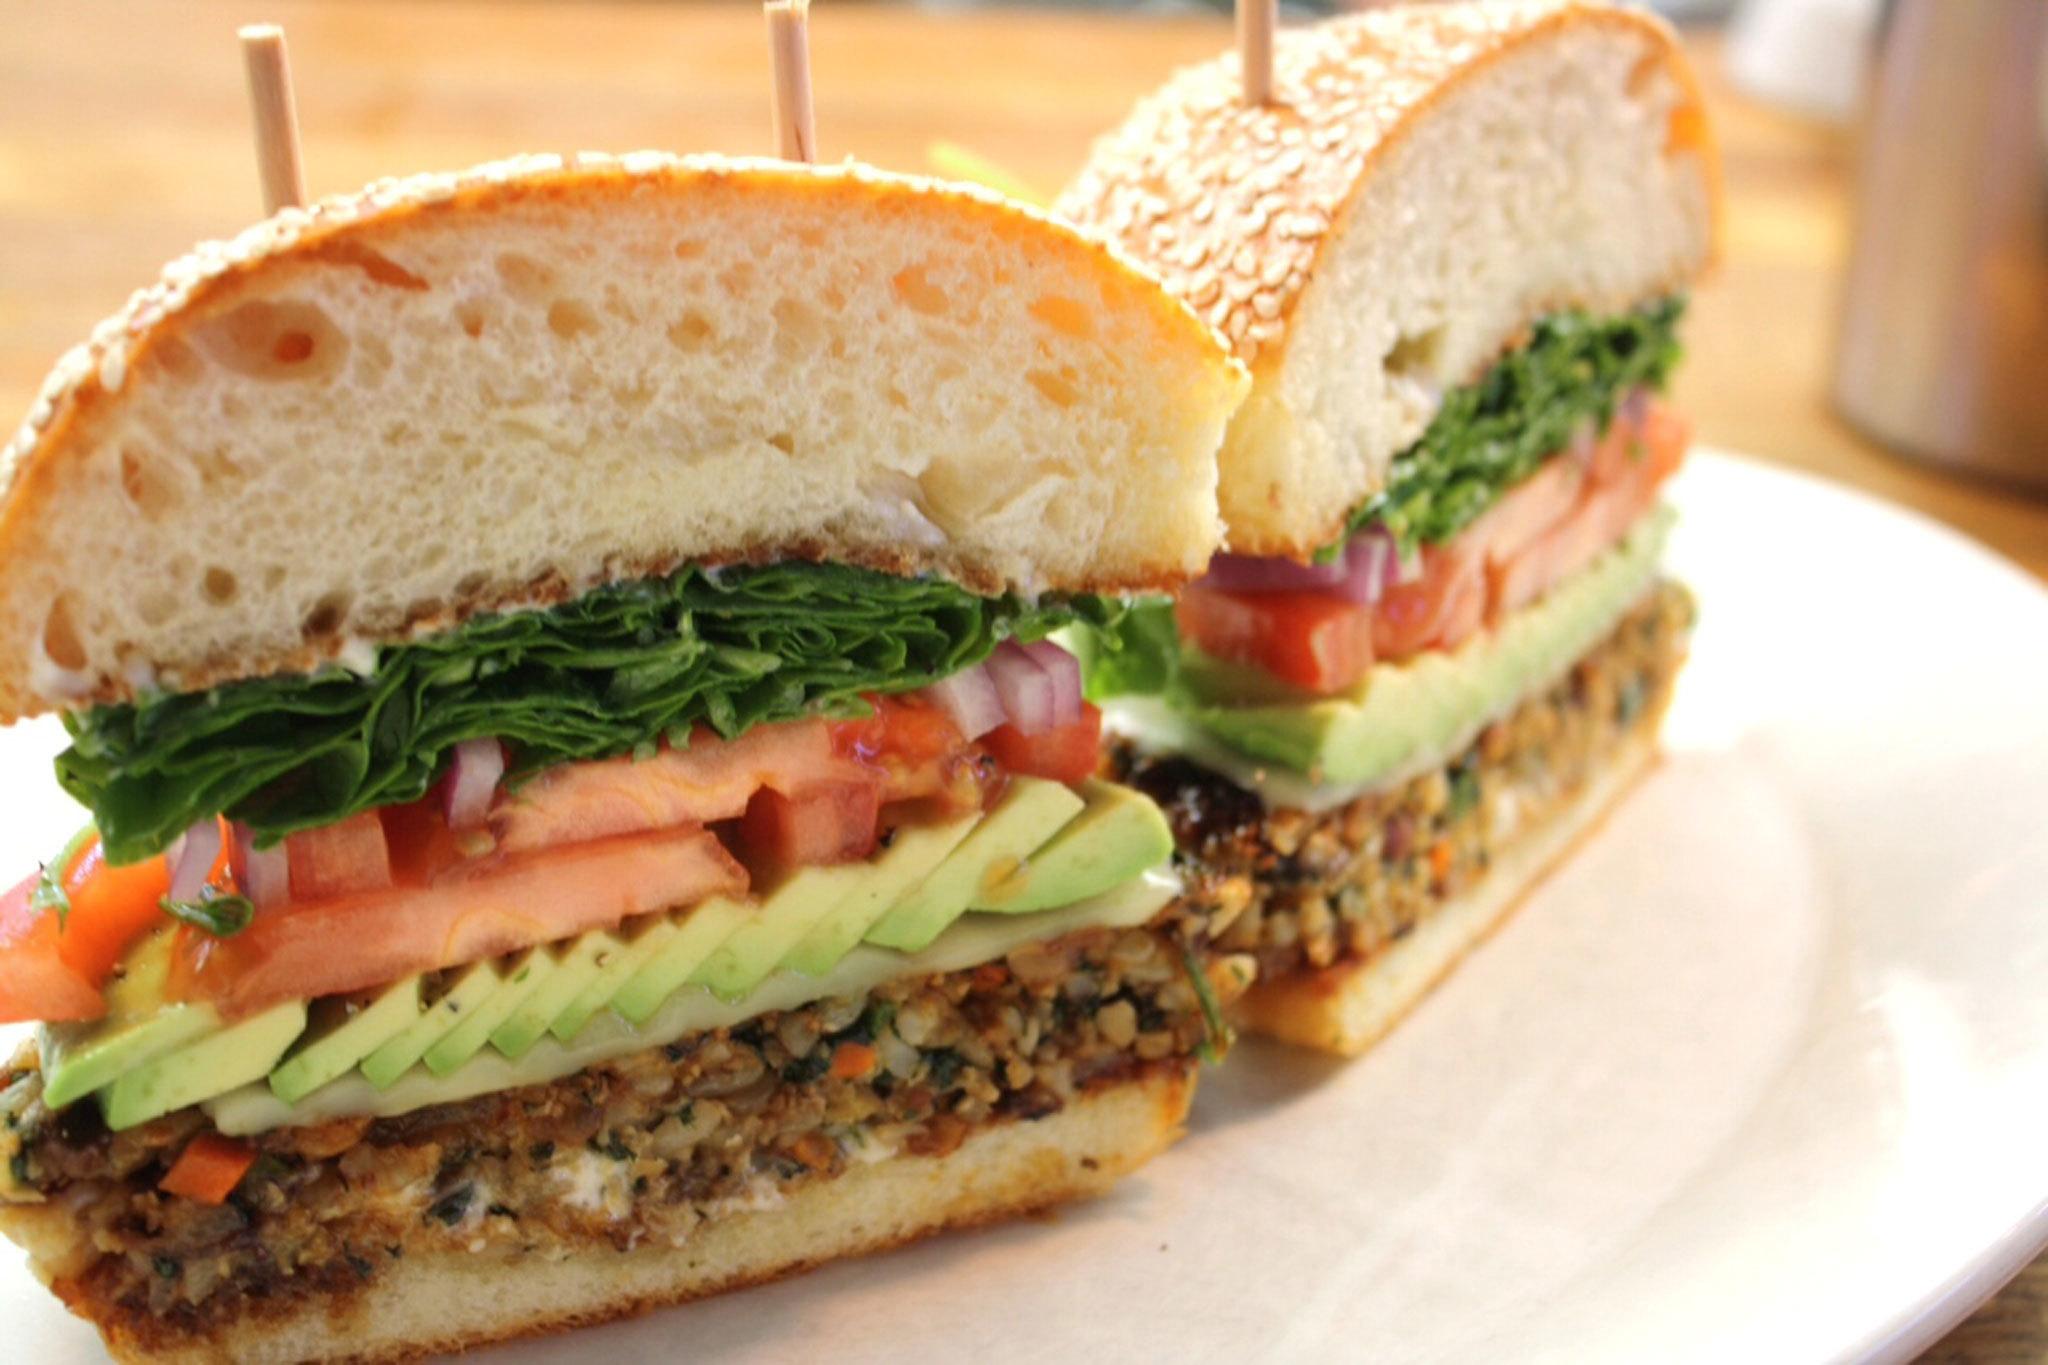 Veggie Burger #5